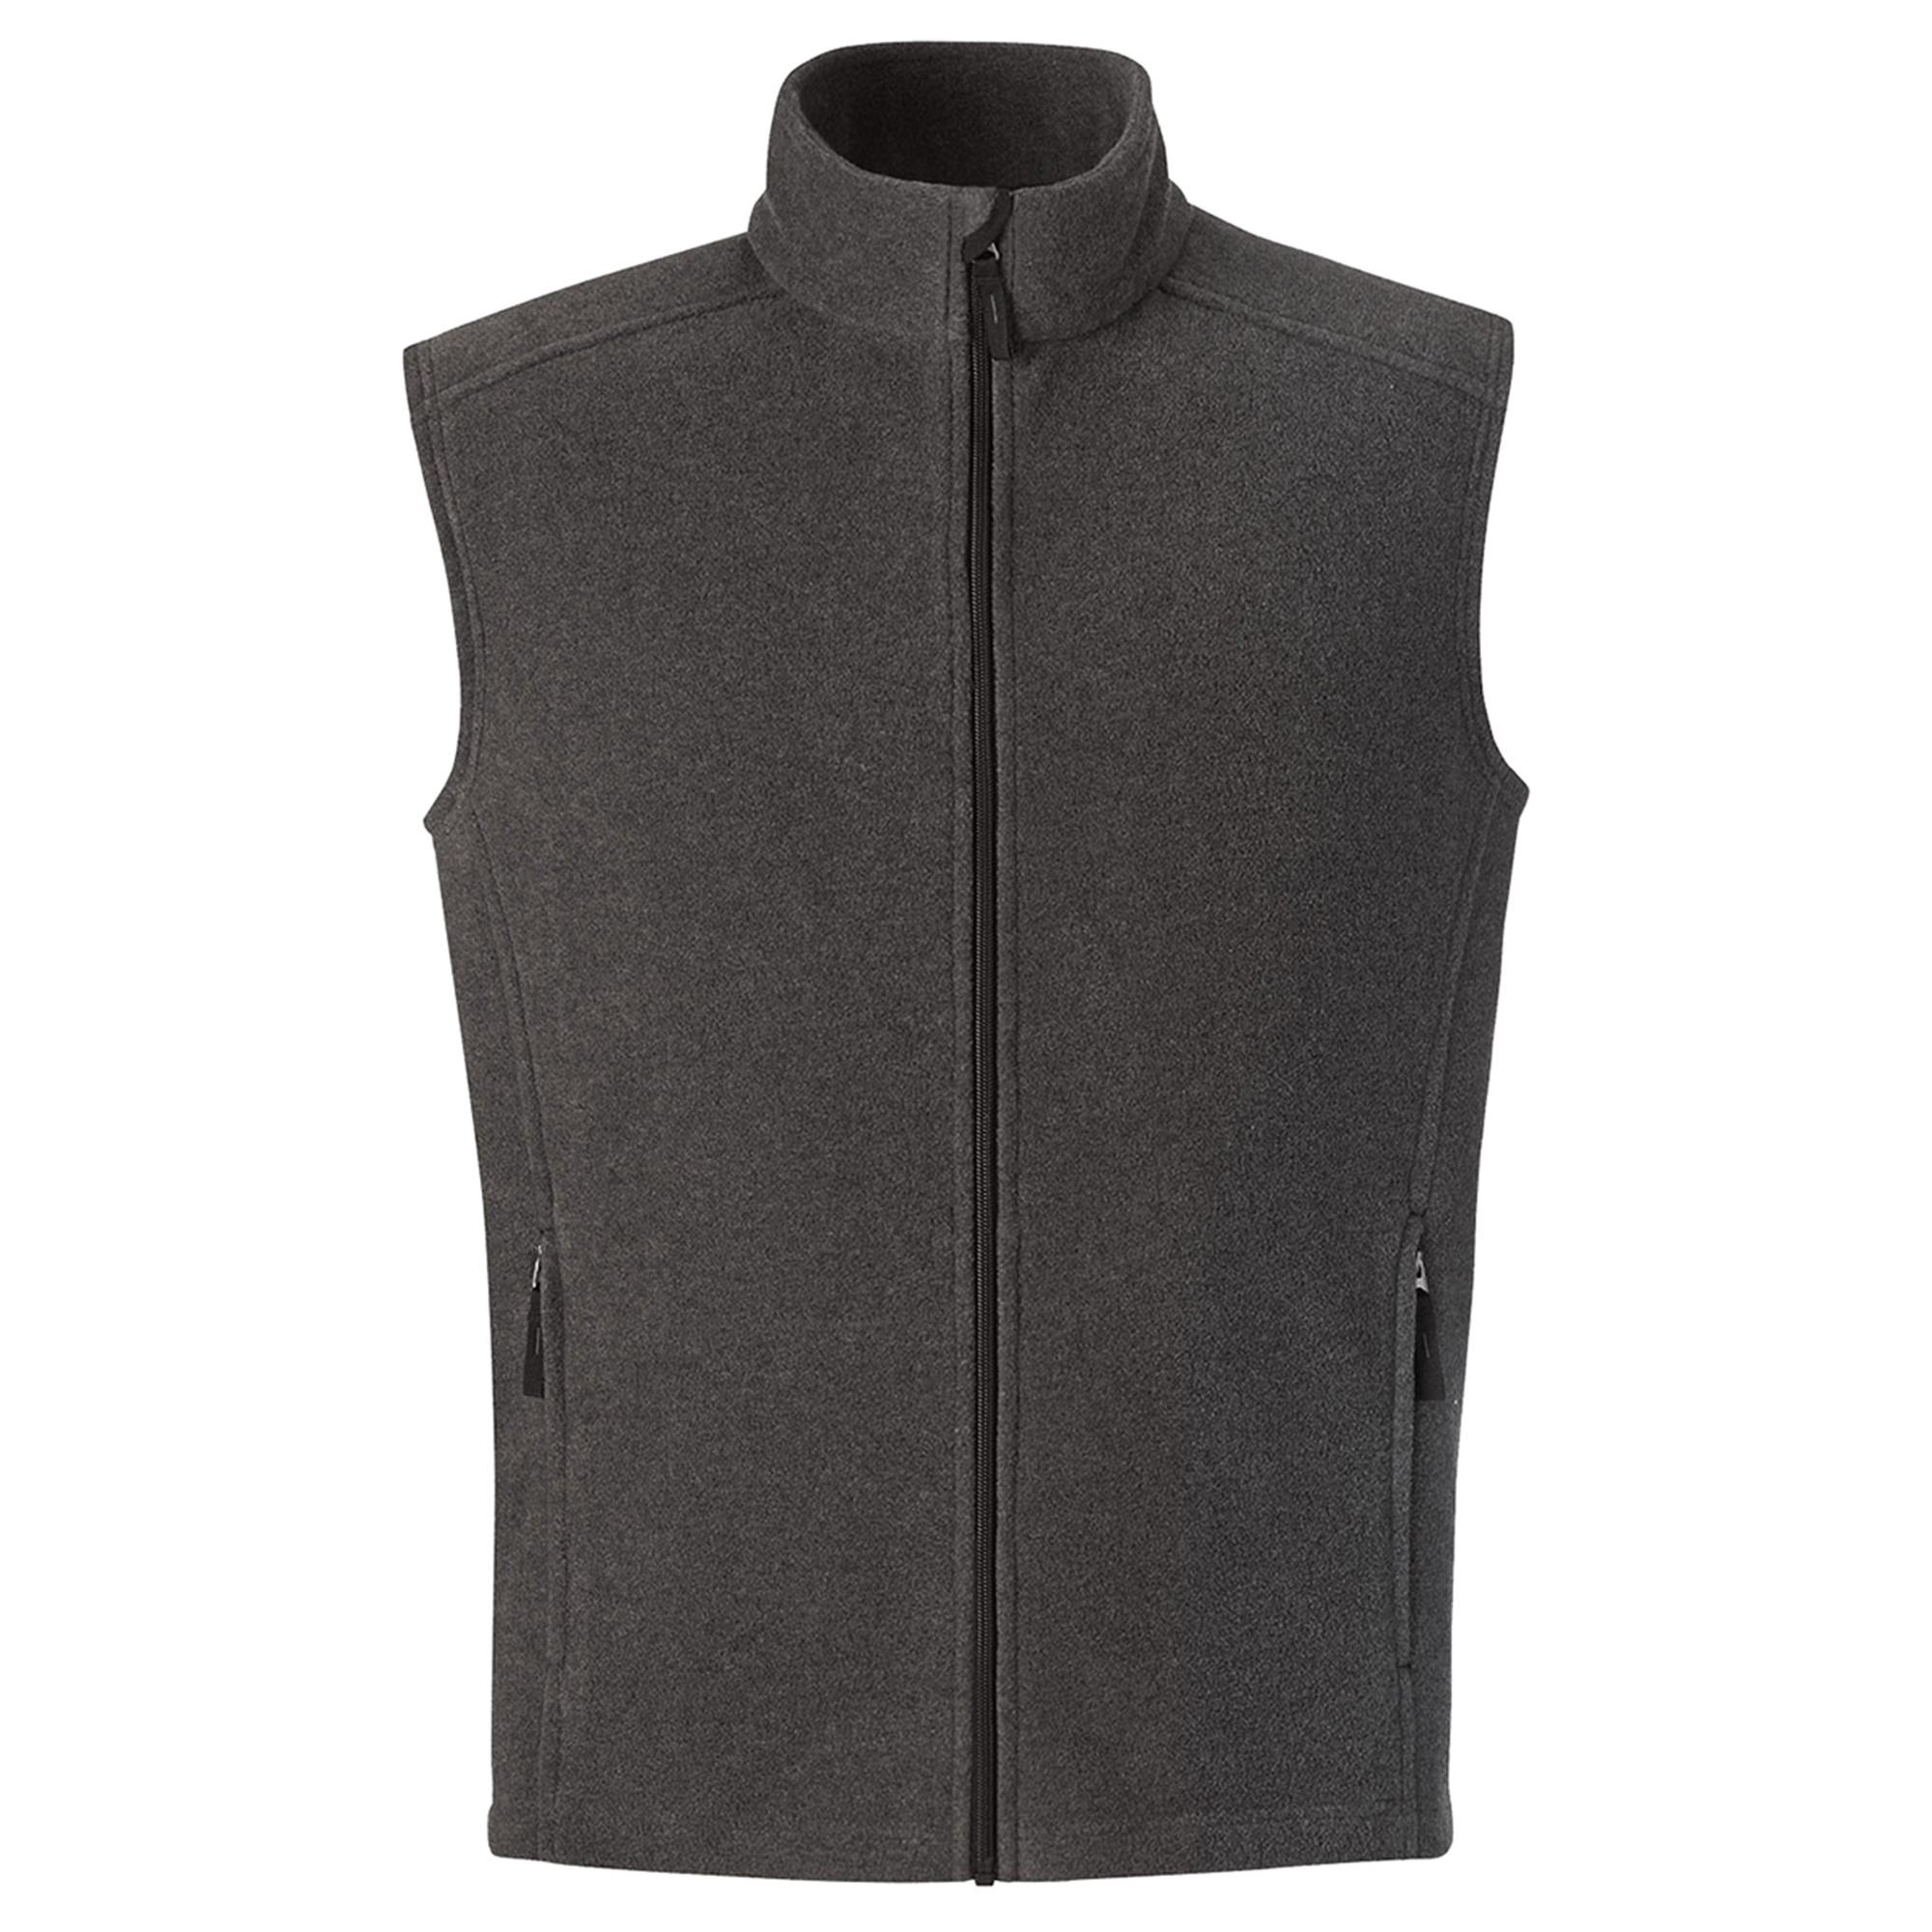 North End 88191 Men's Lower Pocket Anti-Pill Fleece Vest Heather Charcoal-XL